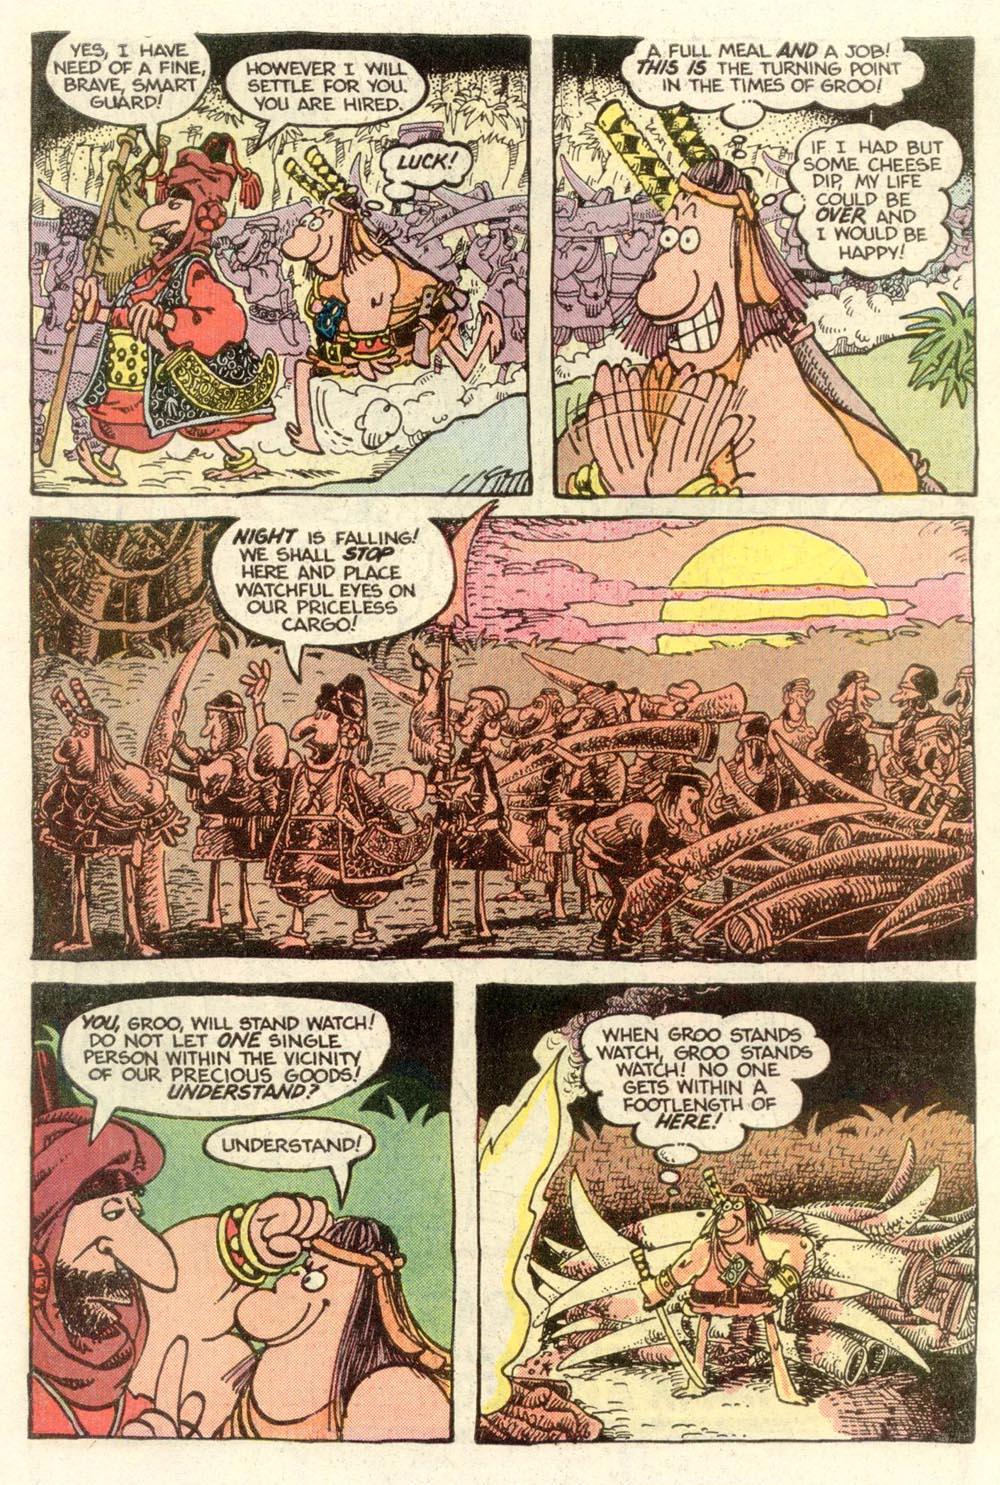 Read online Sergio Aragonés Groo the Wanderer comic -  Issue #7 - 4